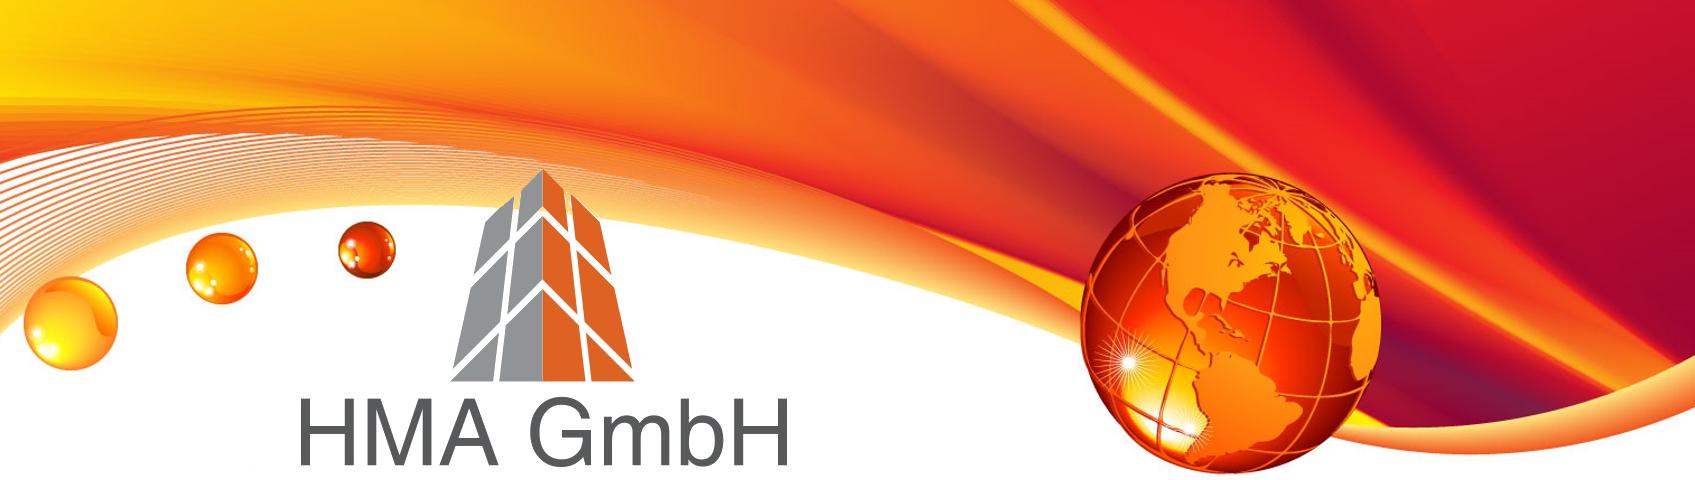 HMA GmbH